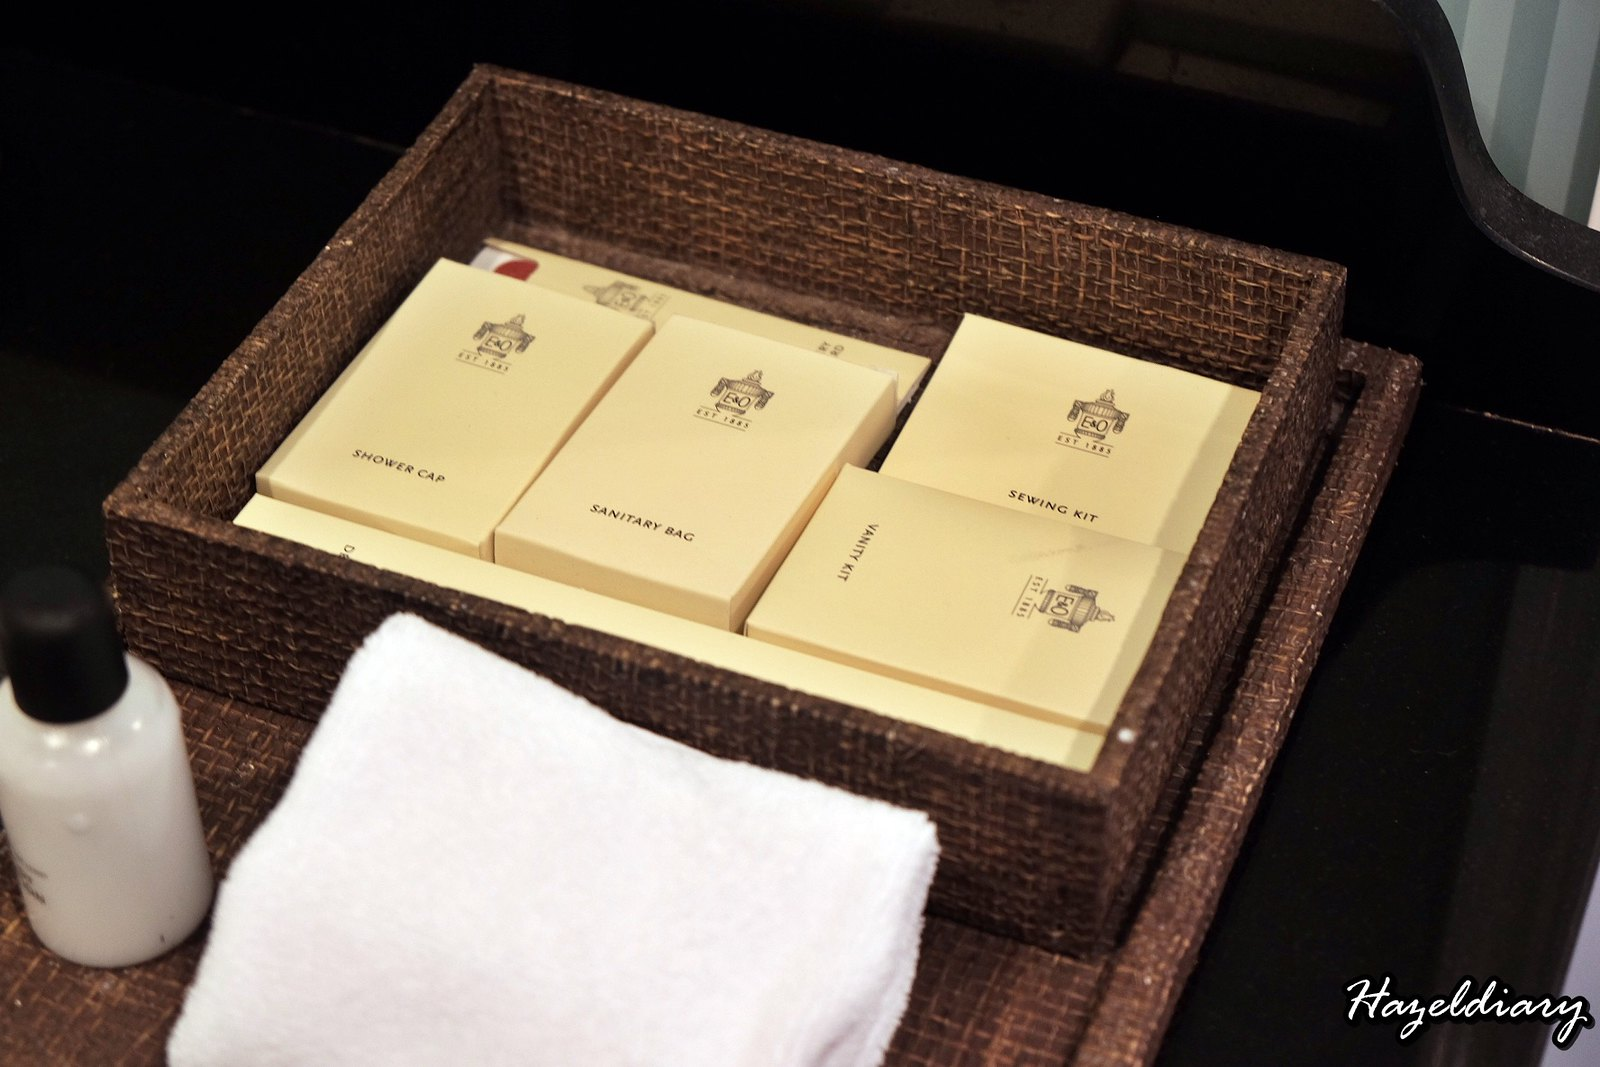 Eastern and Oriental Hotel Penang Malaysia-Hazeldiary-2